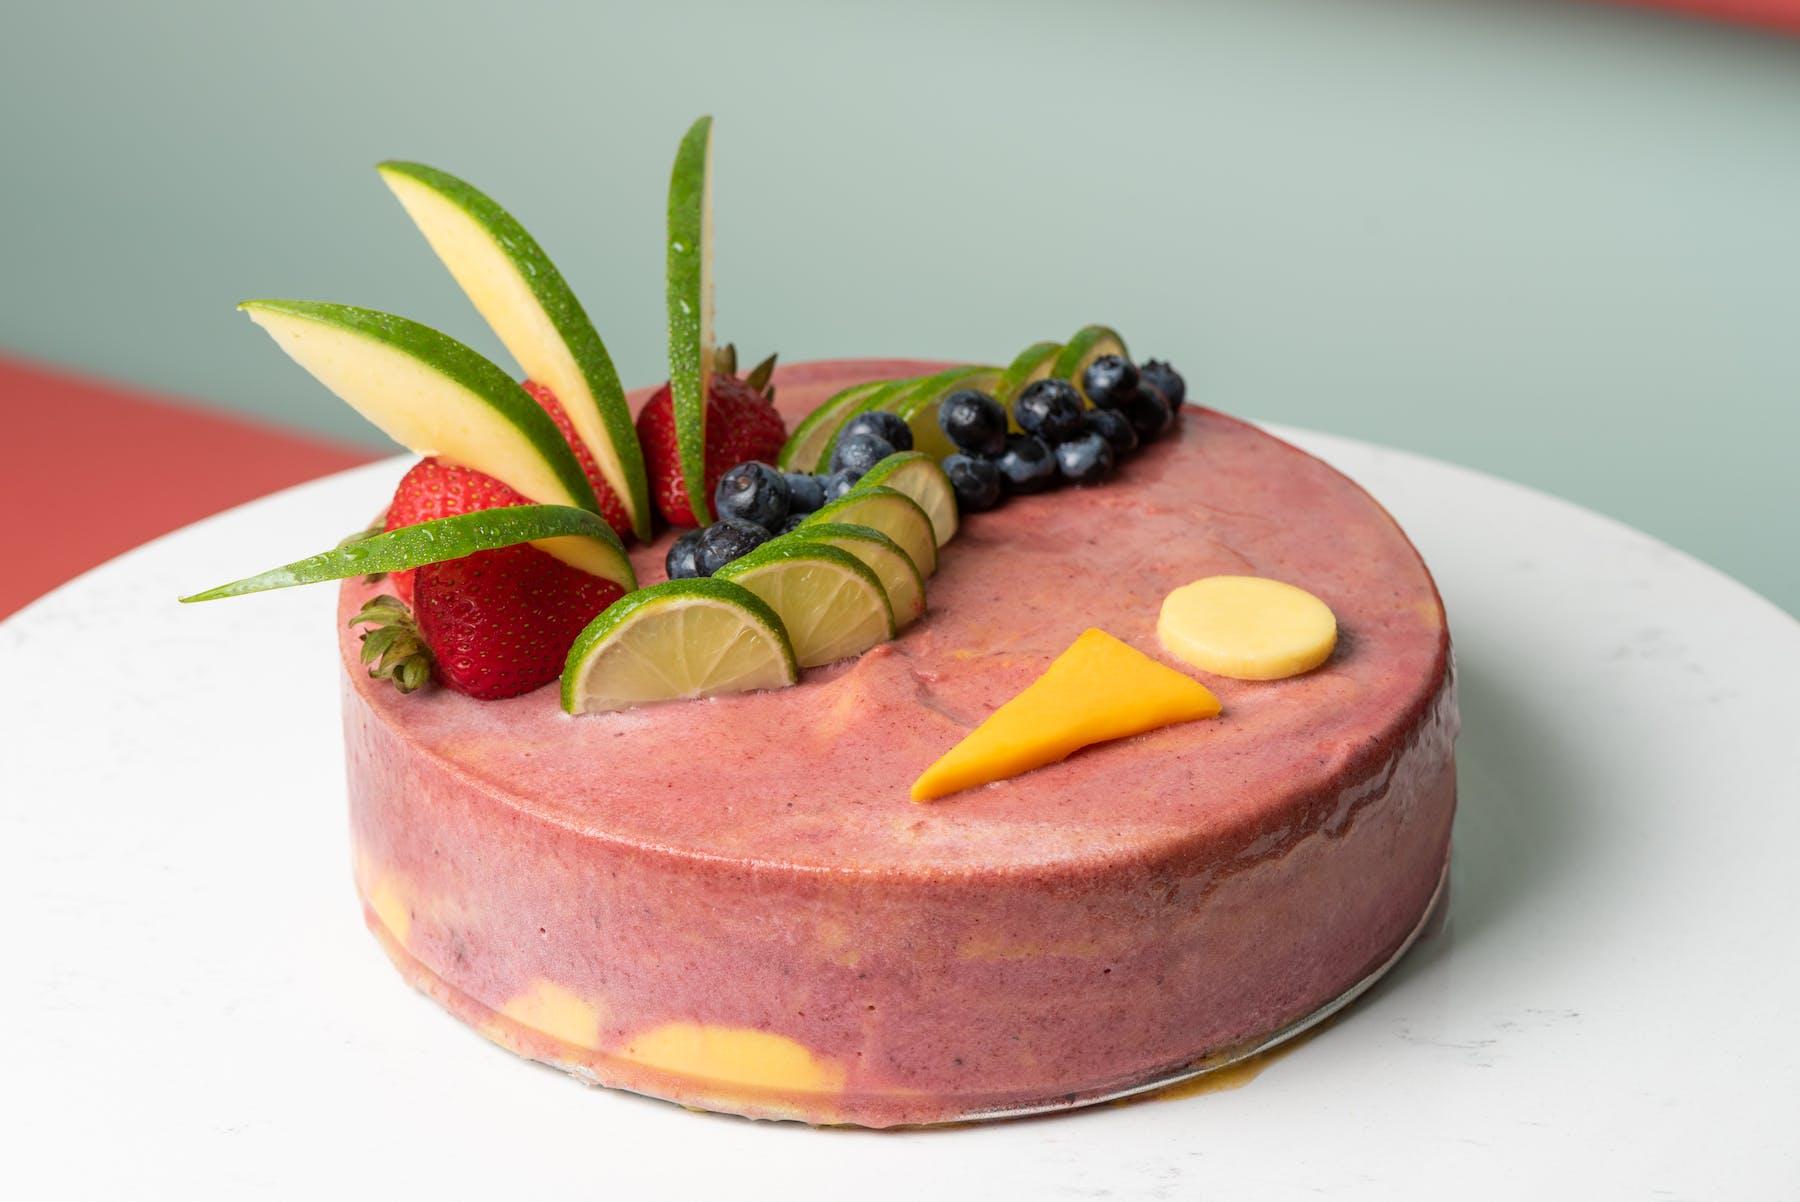 a close up of a pink fruit cake